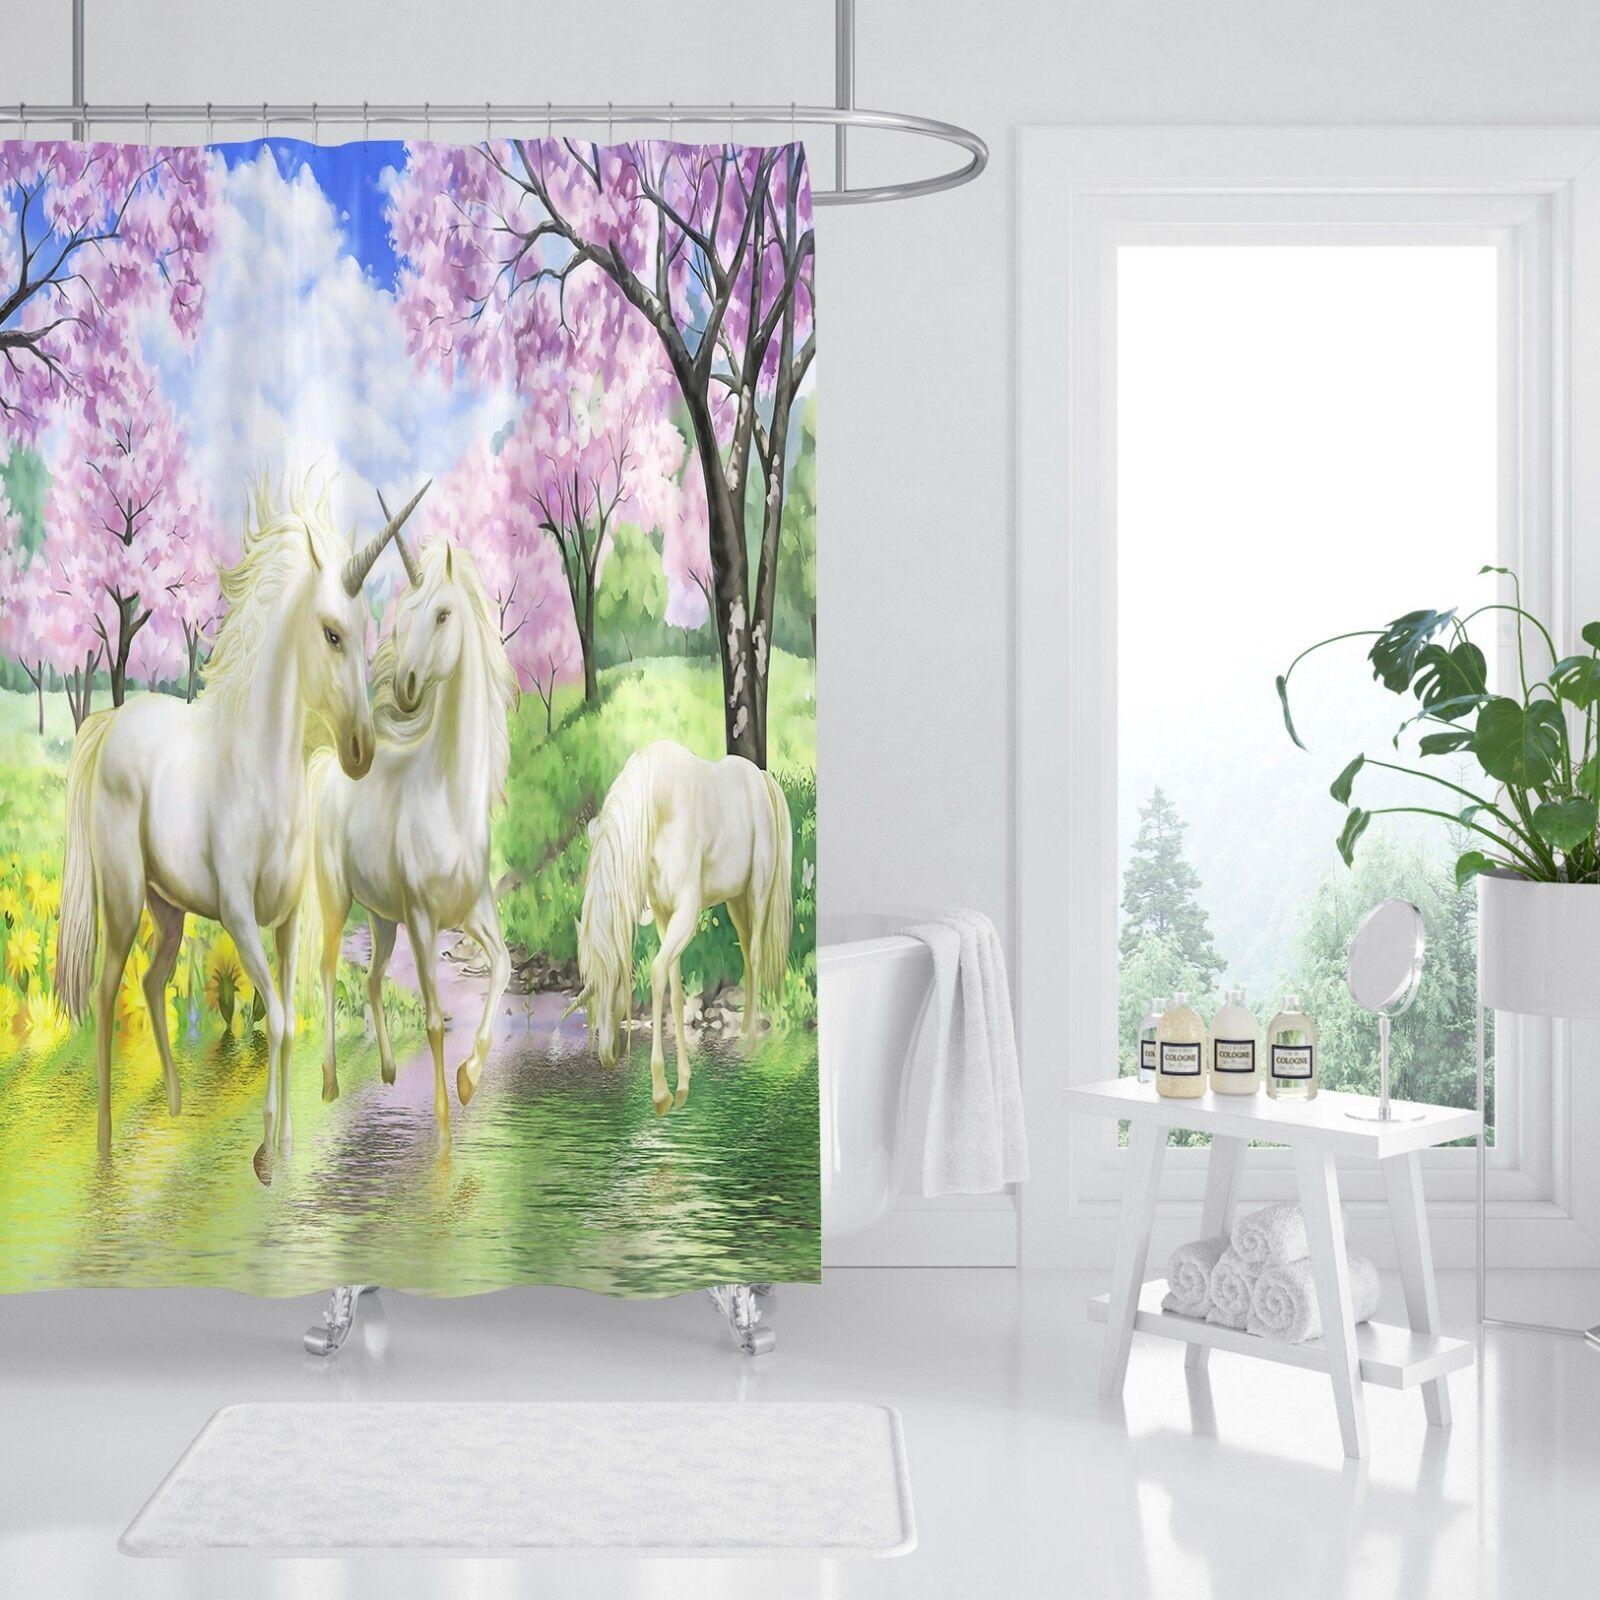 3D Unicorn River 46 Shower Curtain Waterproof Fiber Bathroom Home Windows Toilet